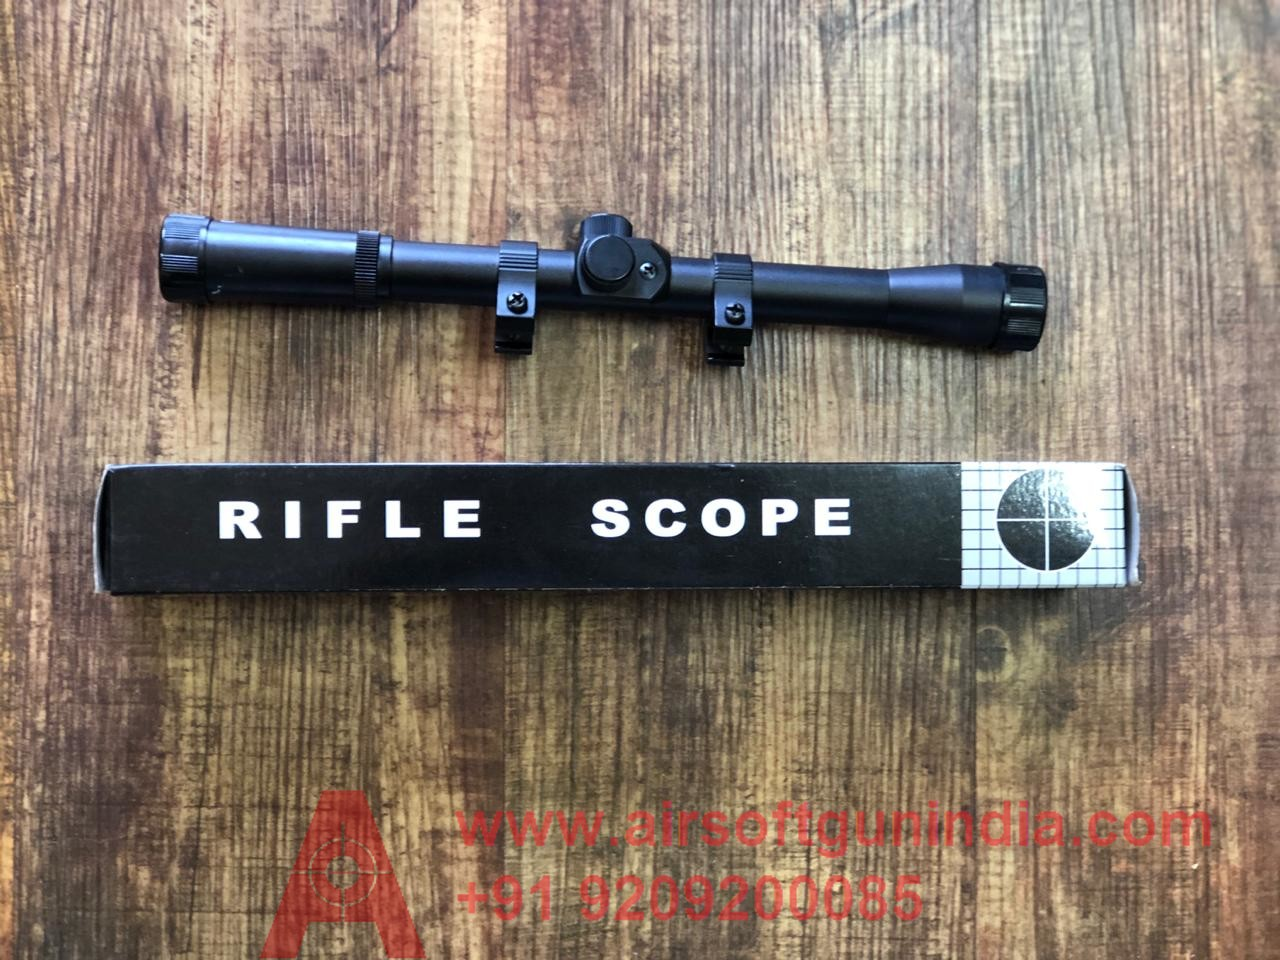 Rifle Scope By Airsoft Gun India